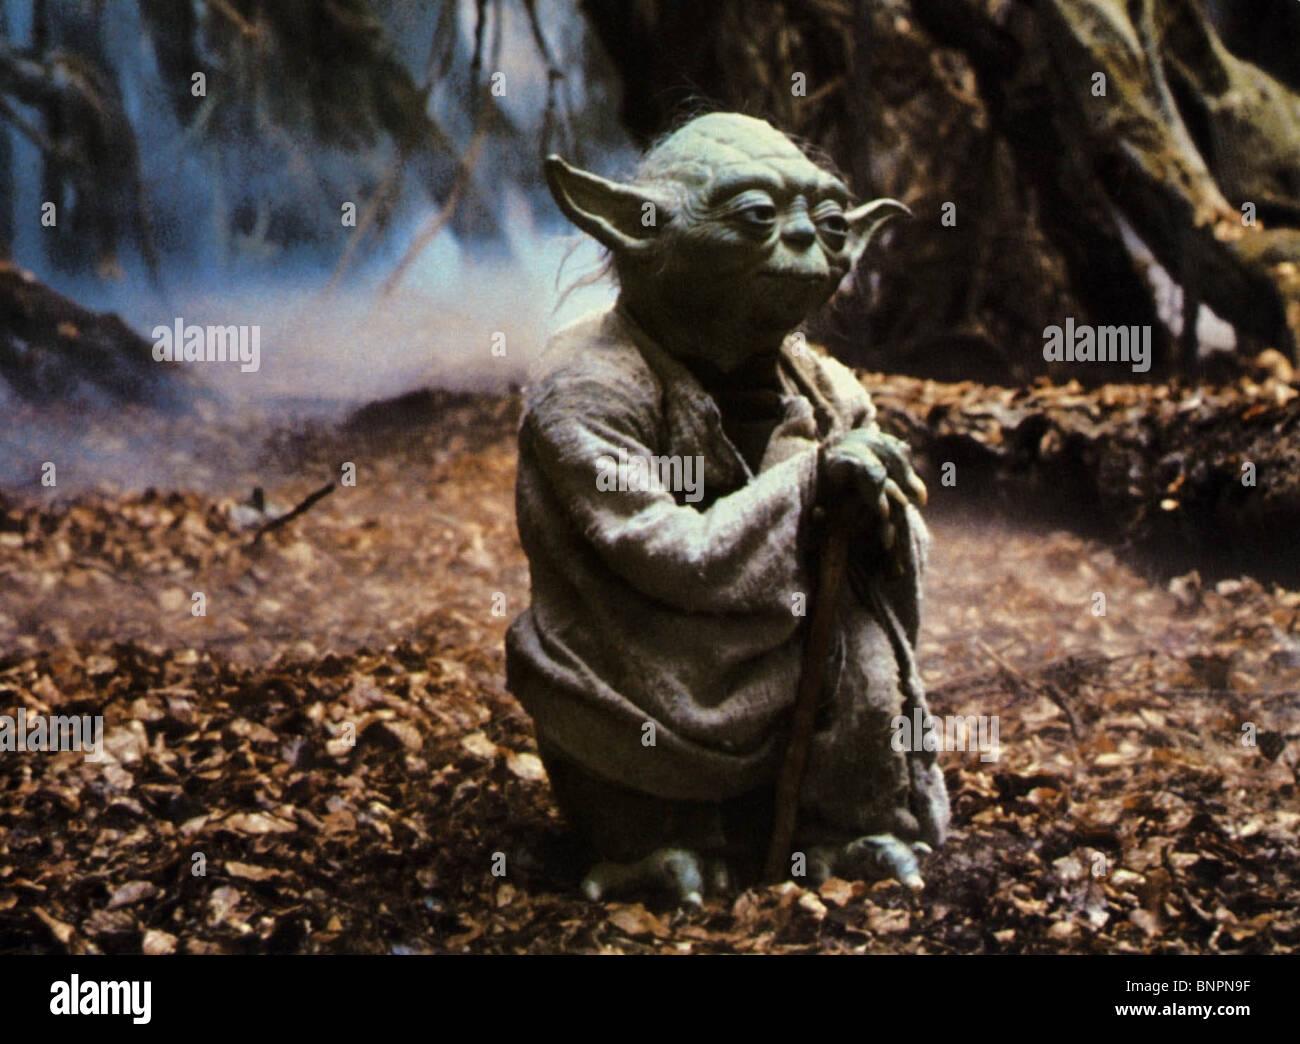 Yoda Star Wars The Empire Strikes Back Star Wars Episode V